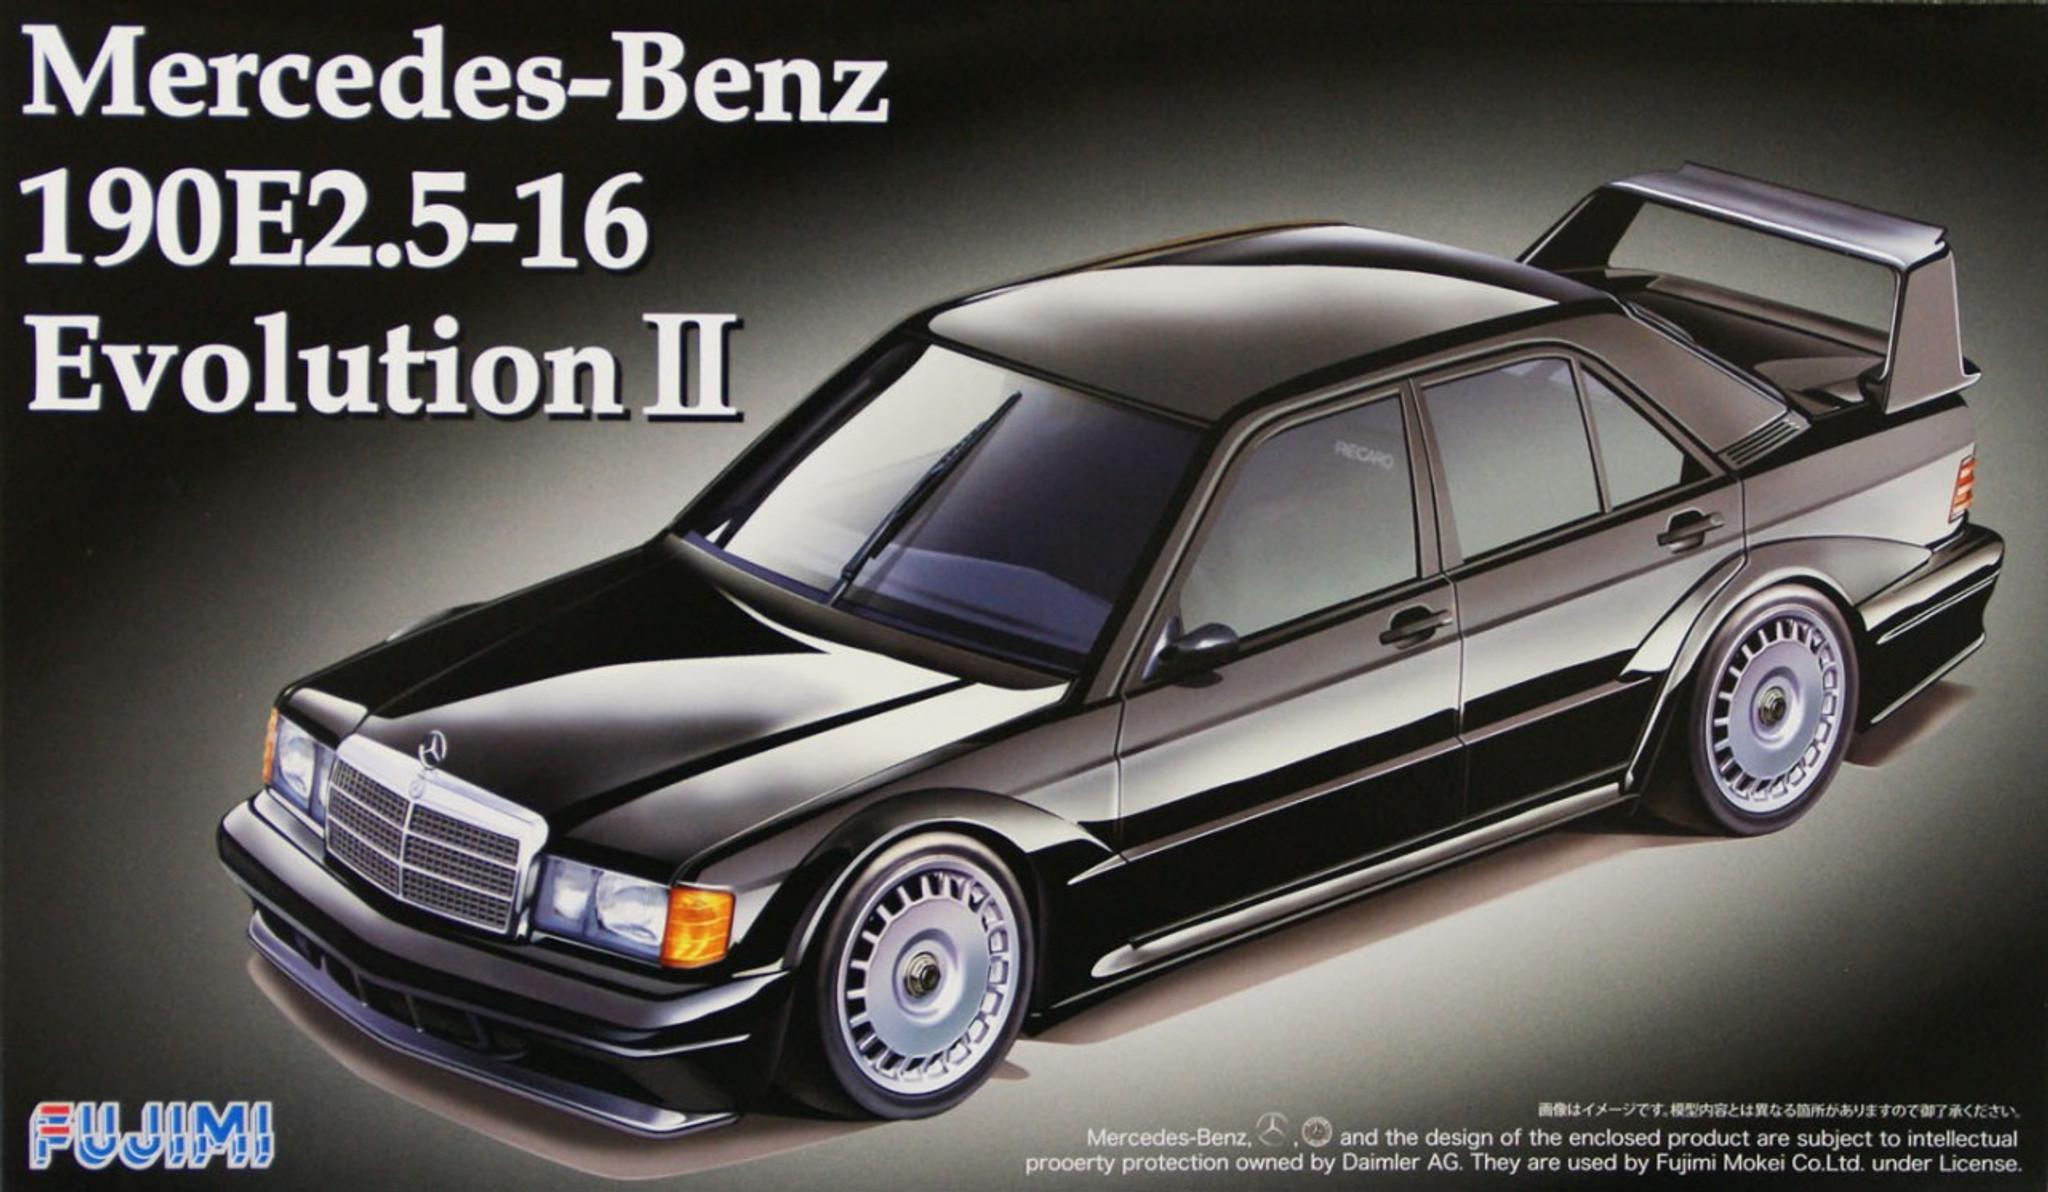 Fujimi RS-14 Mercedes Benz 190E 2 5-16 Evolution II 1/24 Scale Kit